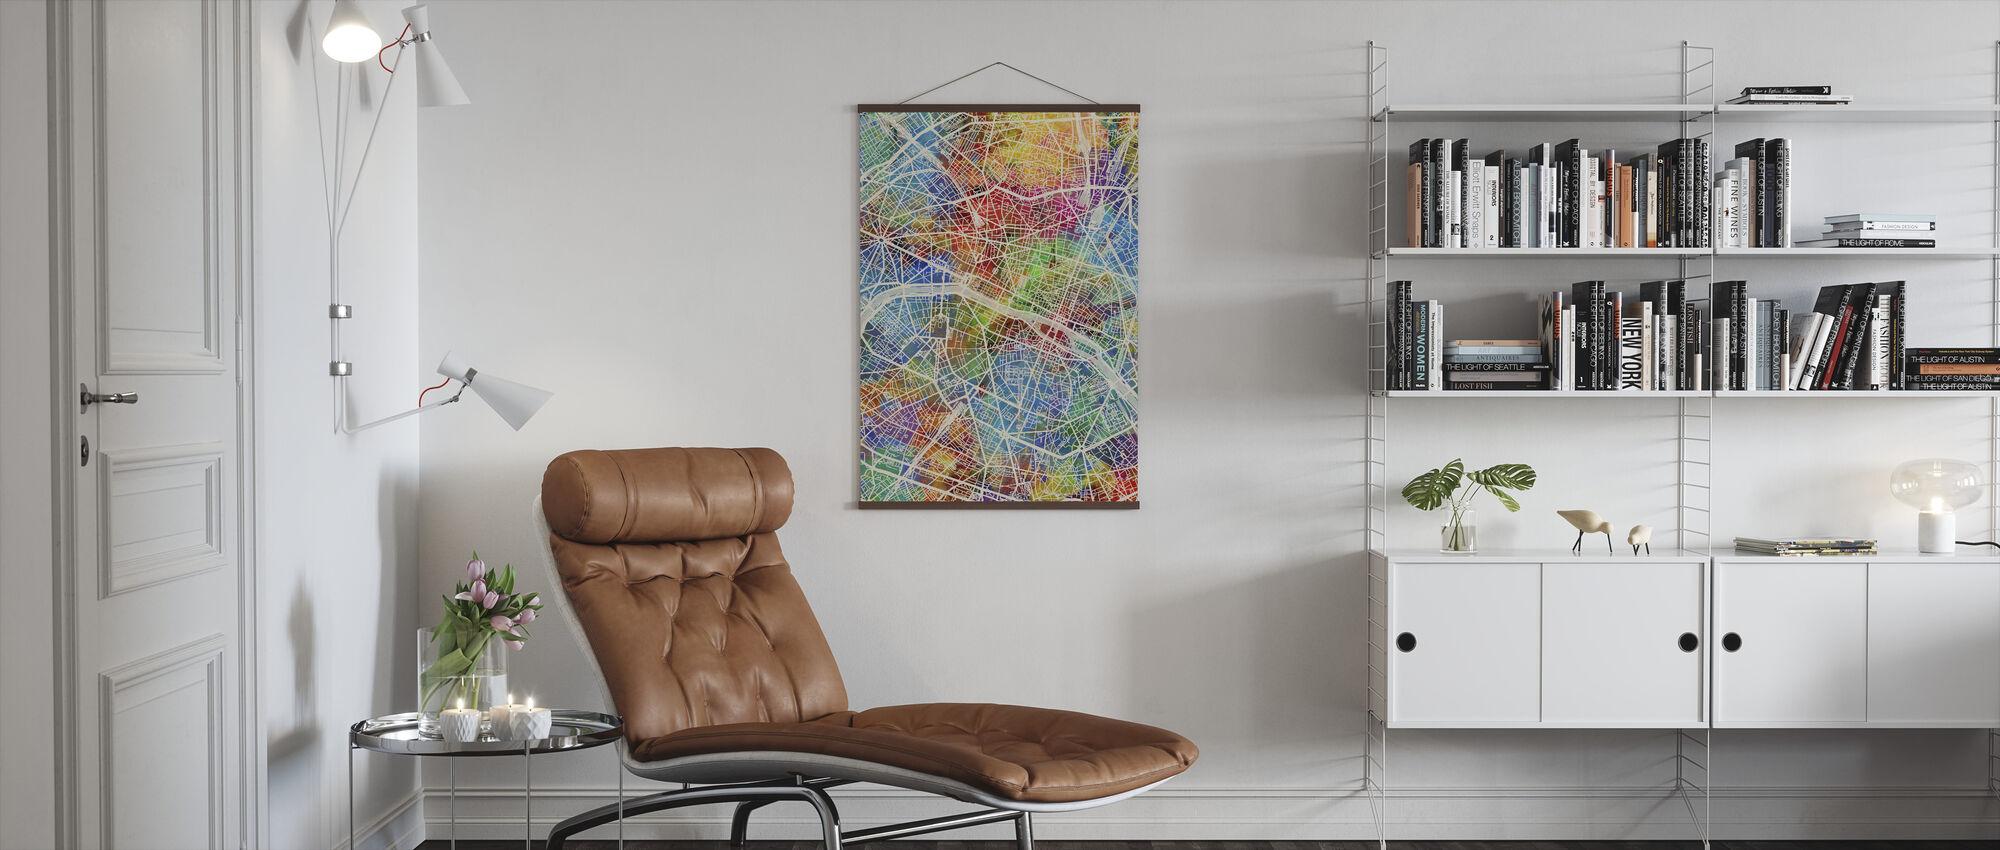 Paris France City Map - Poster - Living Room